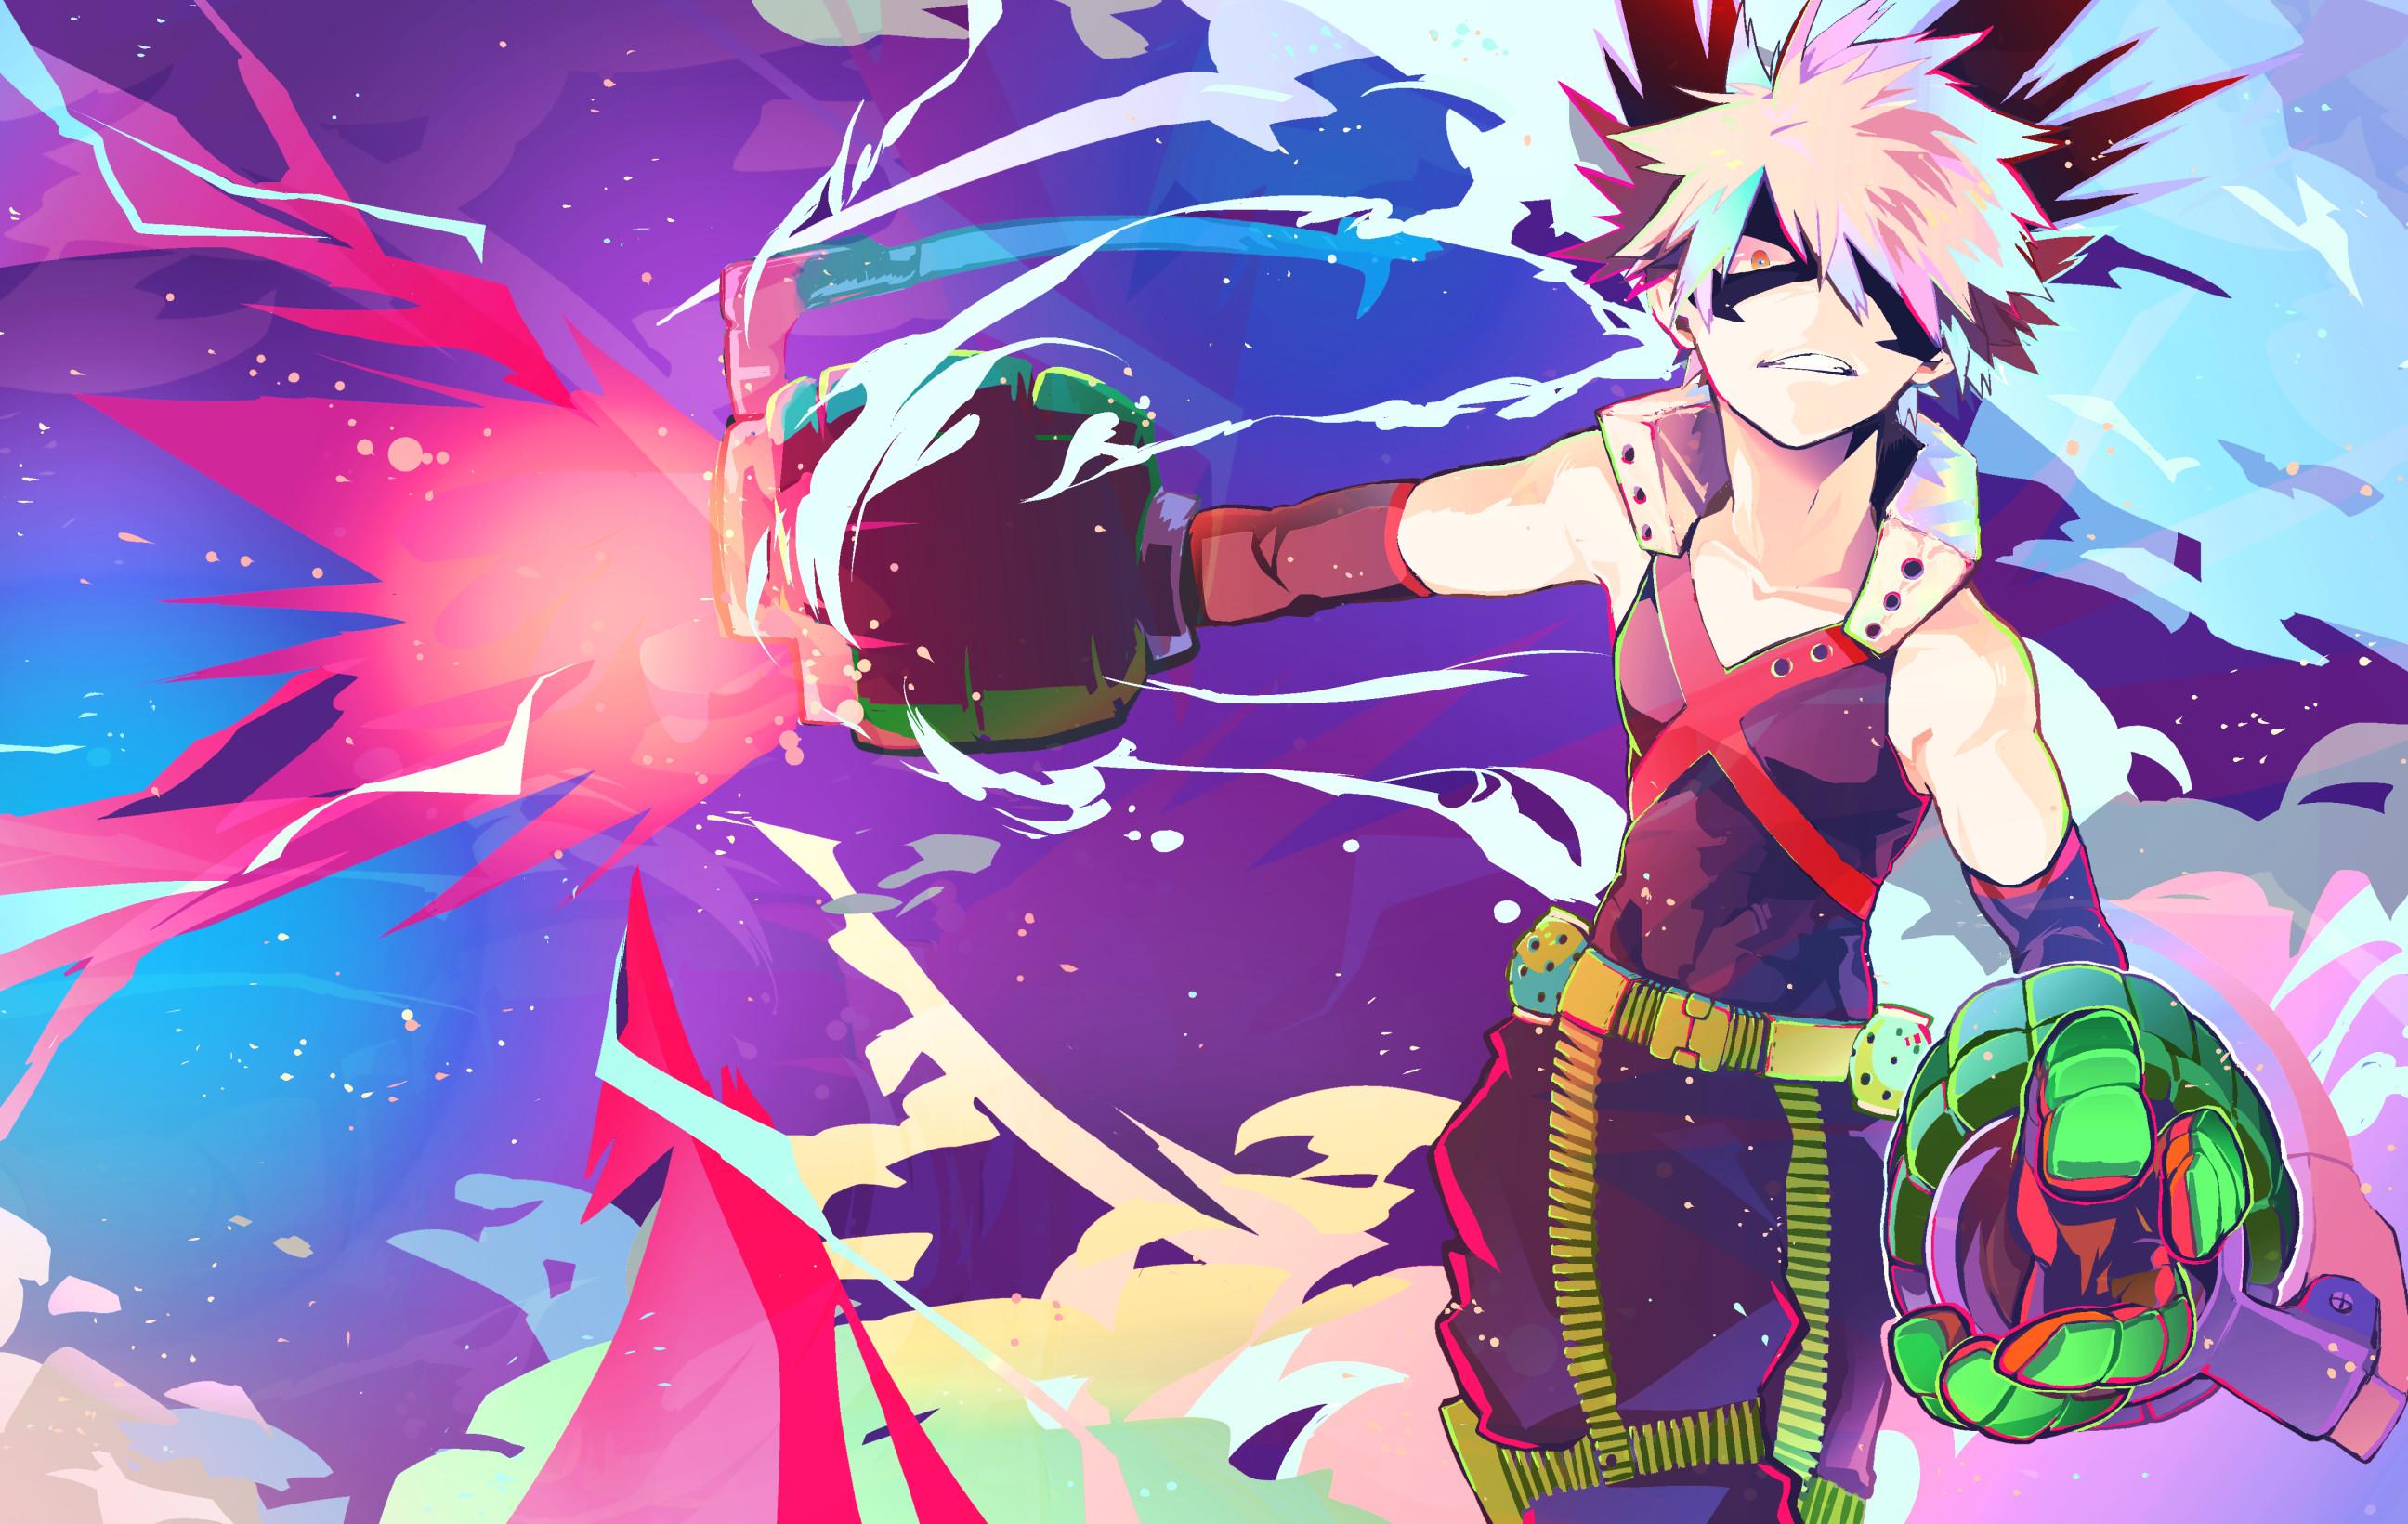 Cute deku mha anime bnha my hero academia izuku green midoriya izuku midoriya todoroki bakugo pink mha ship red. My Hero Academia Wallpapers ·① WallpaperTag